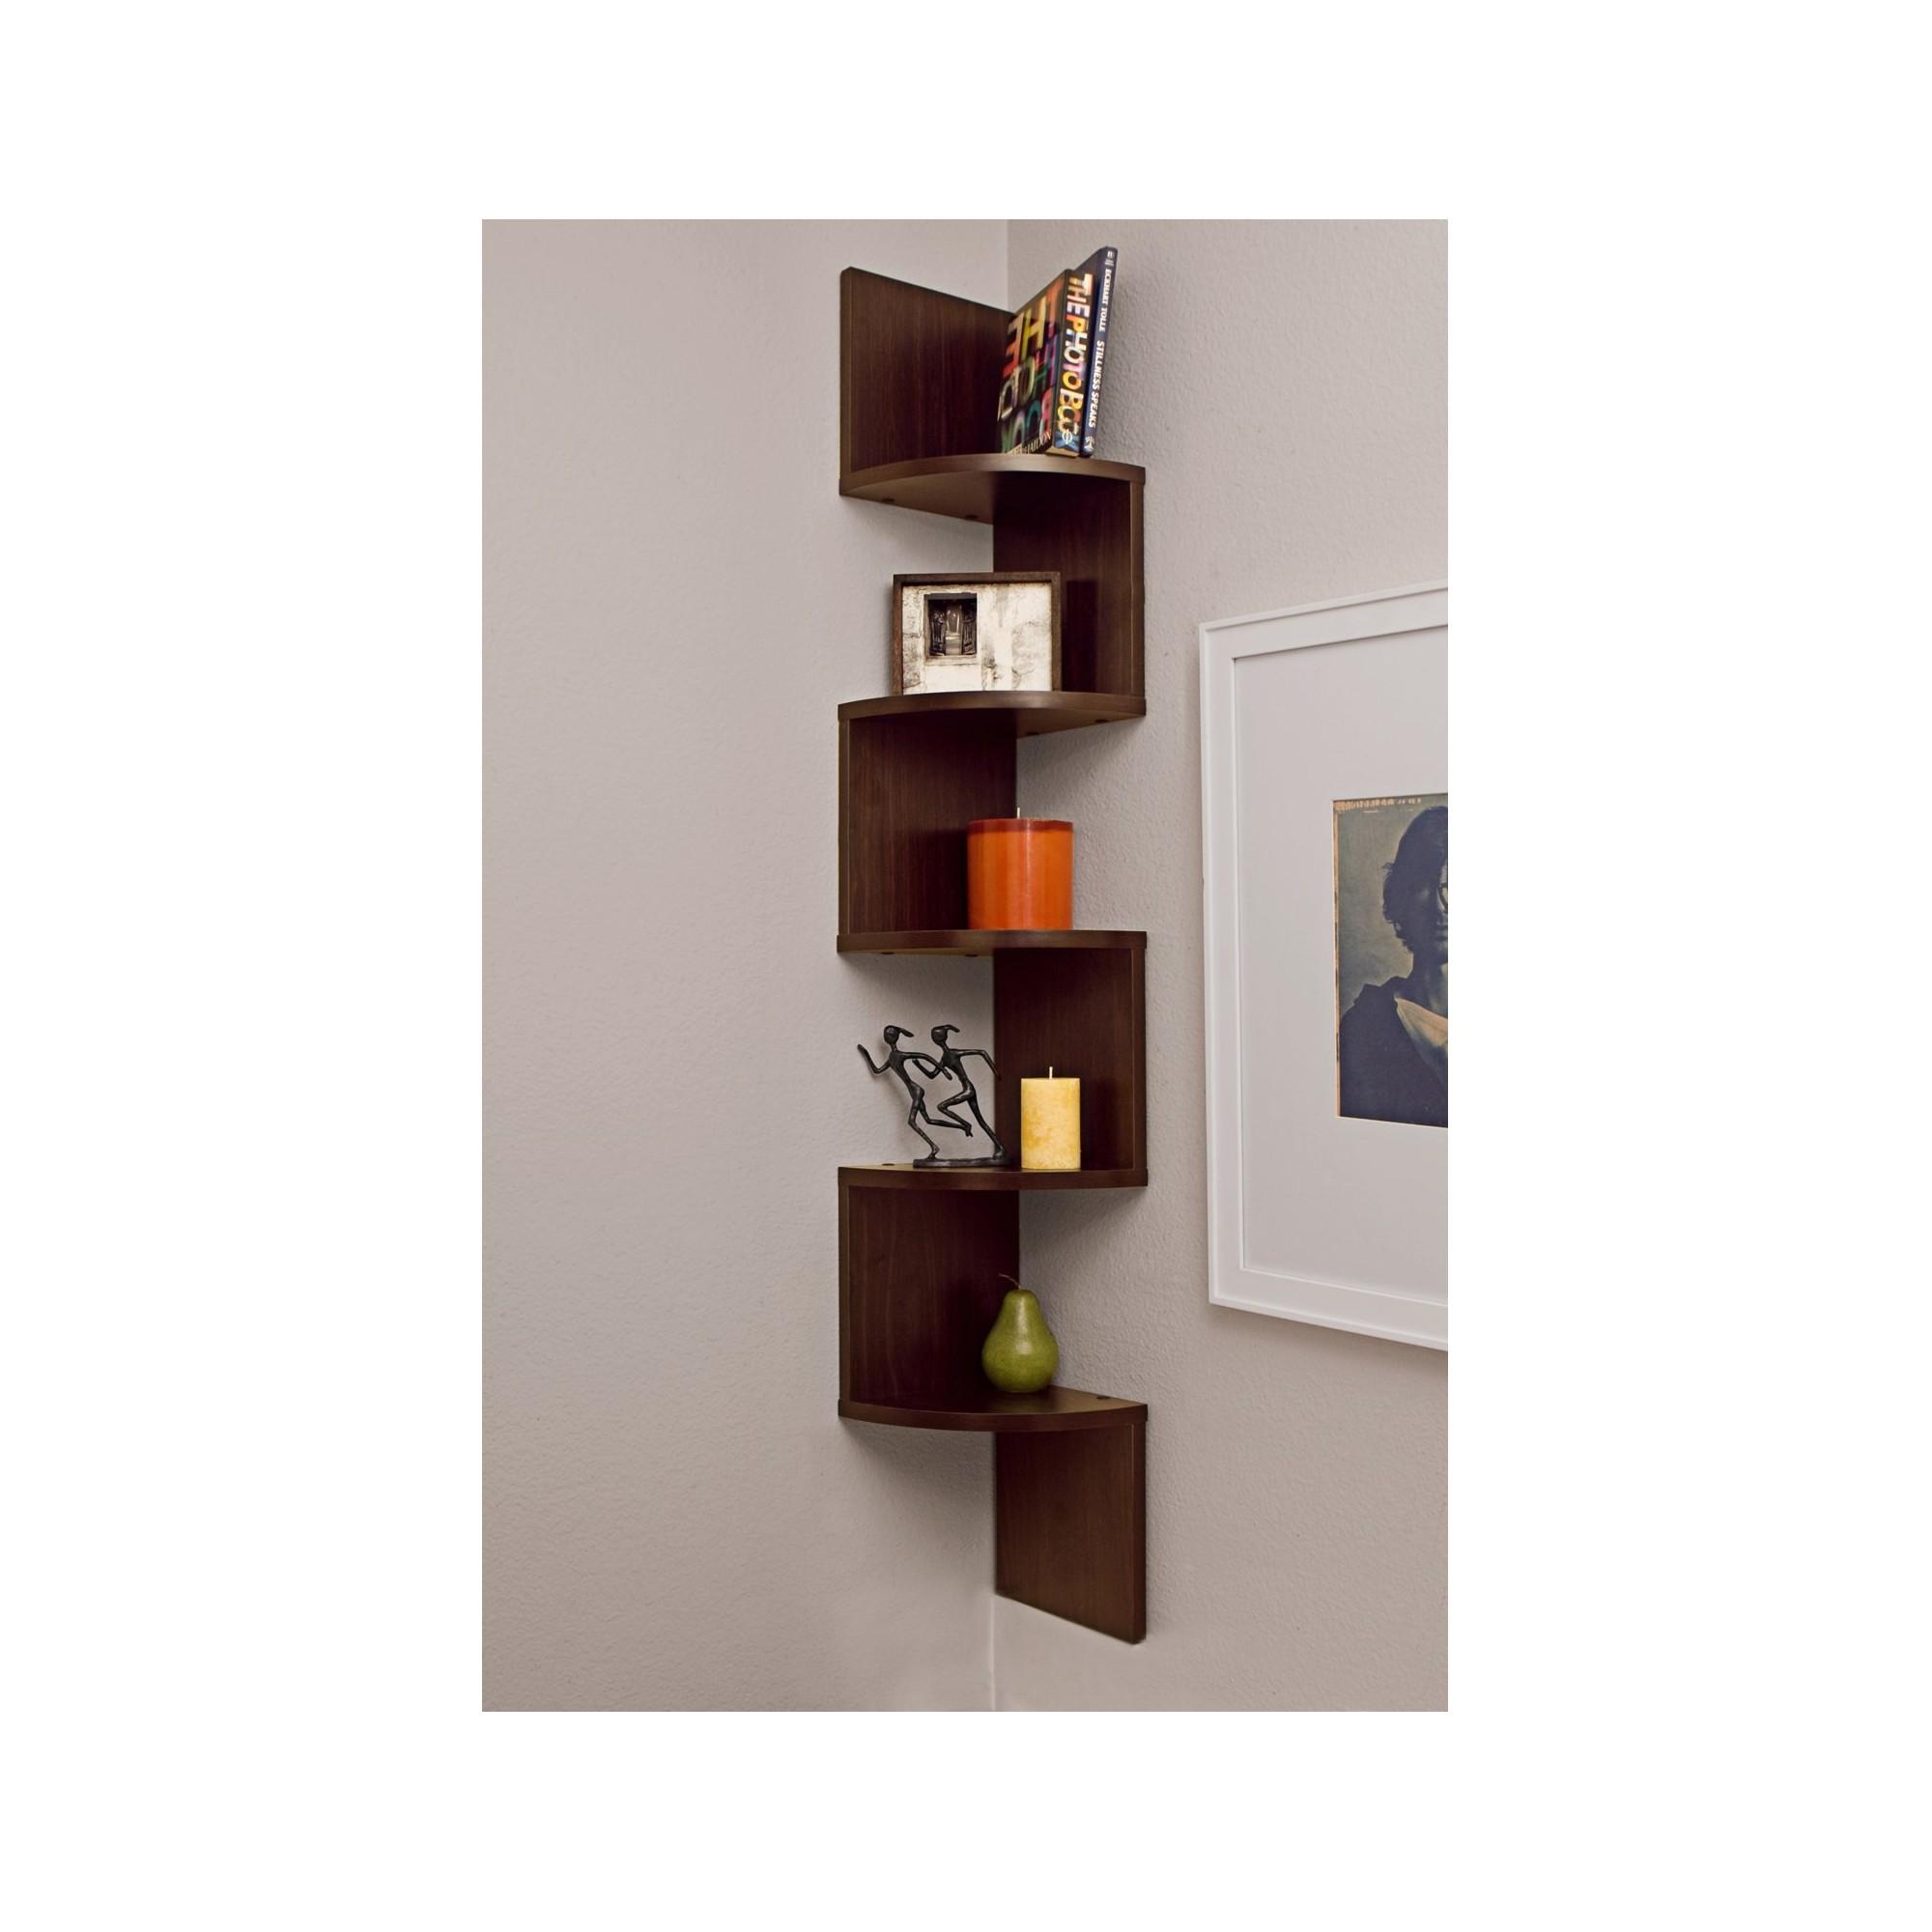 48 5 X 7 7 Zigzag Corner Shelf Walnut Danya B Brown Kitchen Ideas In 2019 Corner Shelves Wall Shelves Wall Mounted Shelves